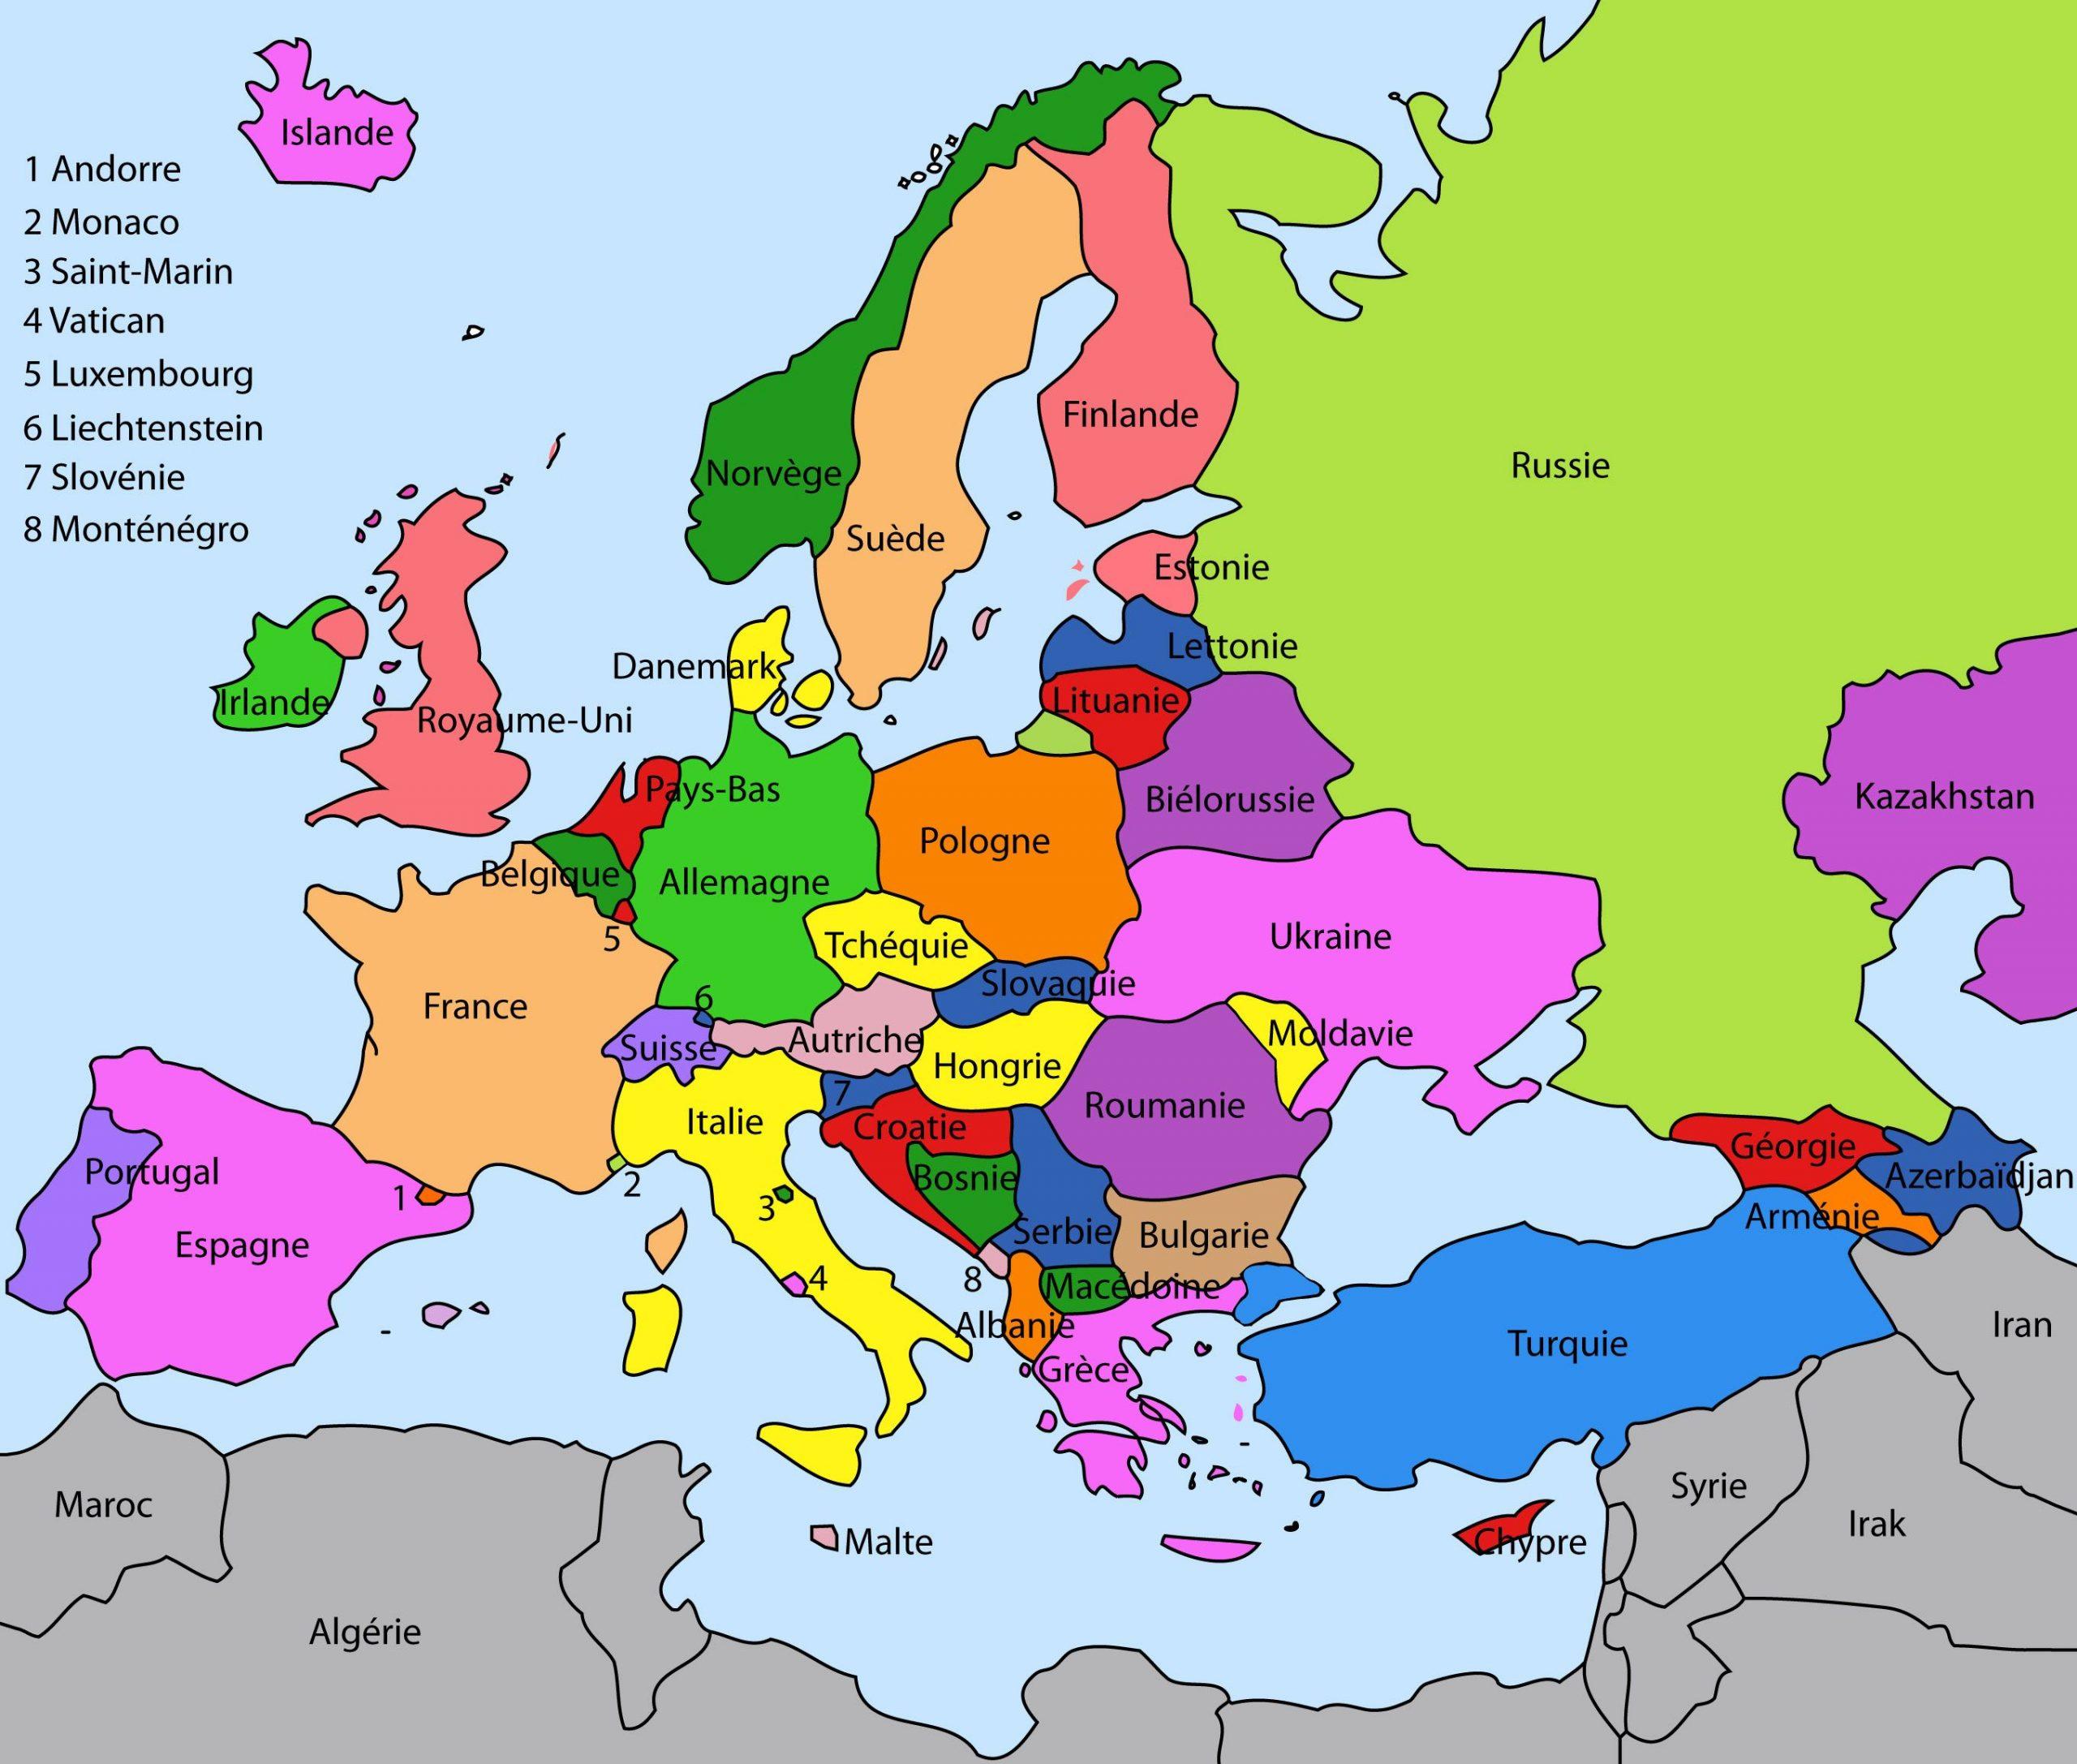 Carte Europe | Carte Europe encequiconcerne Carte D Europe Avec Pays Et Capitales